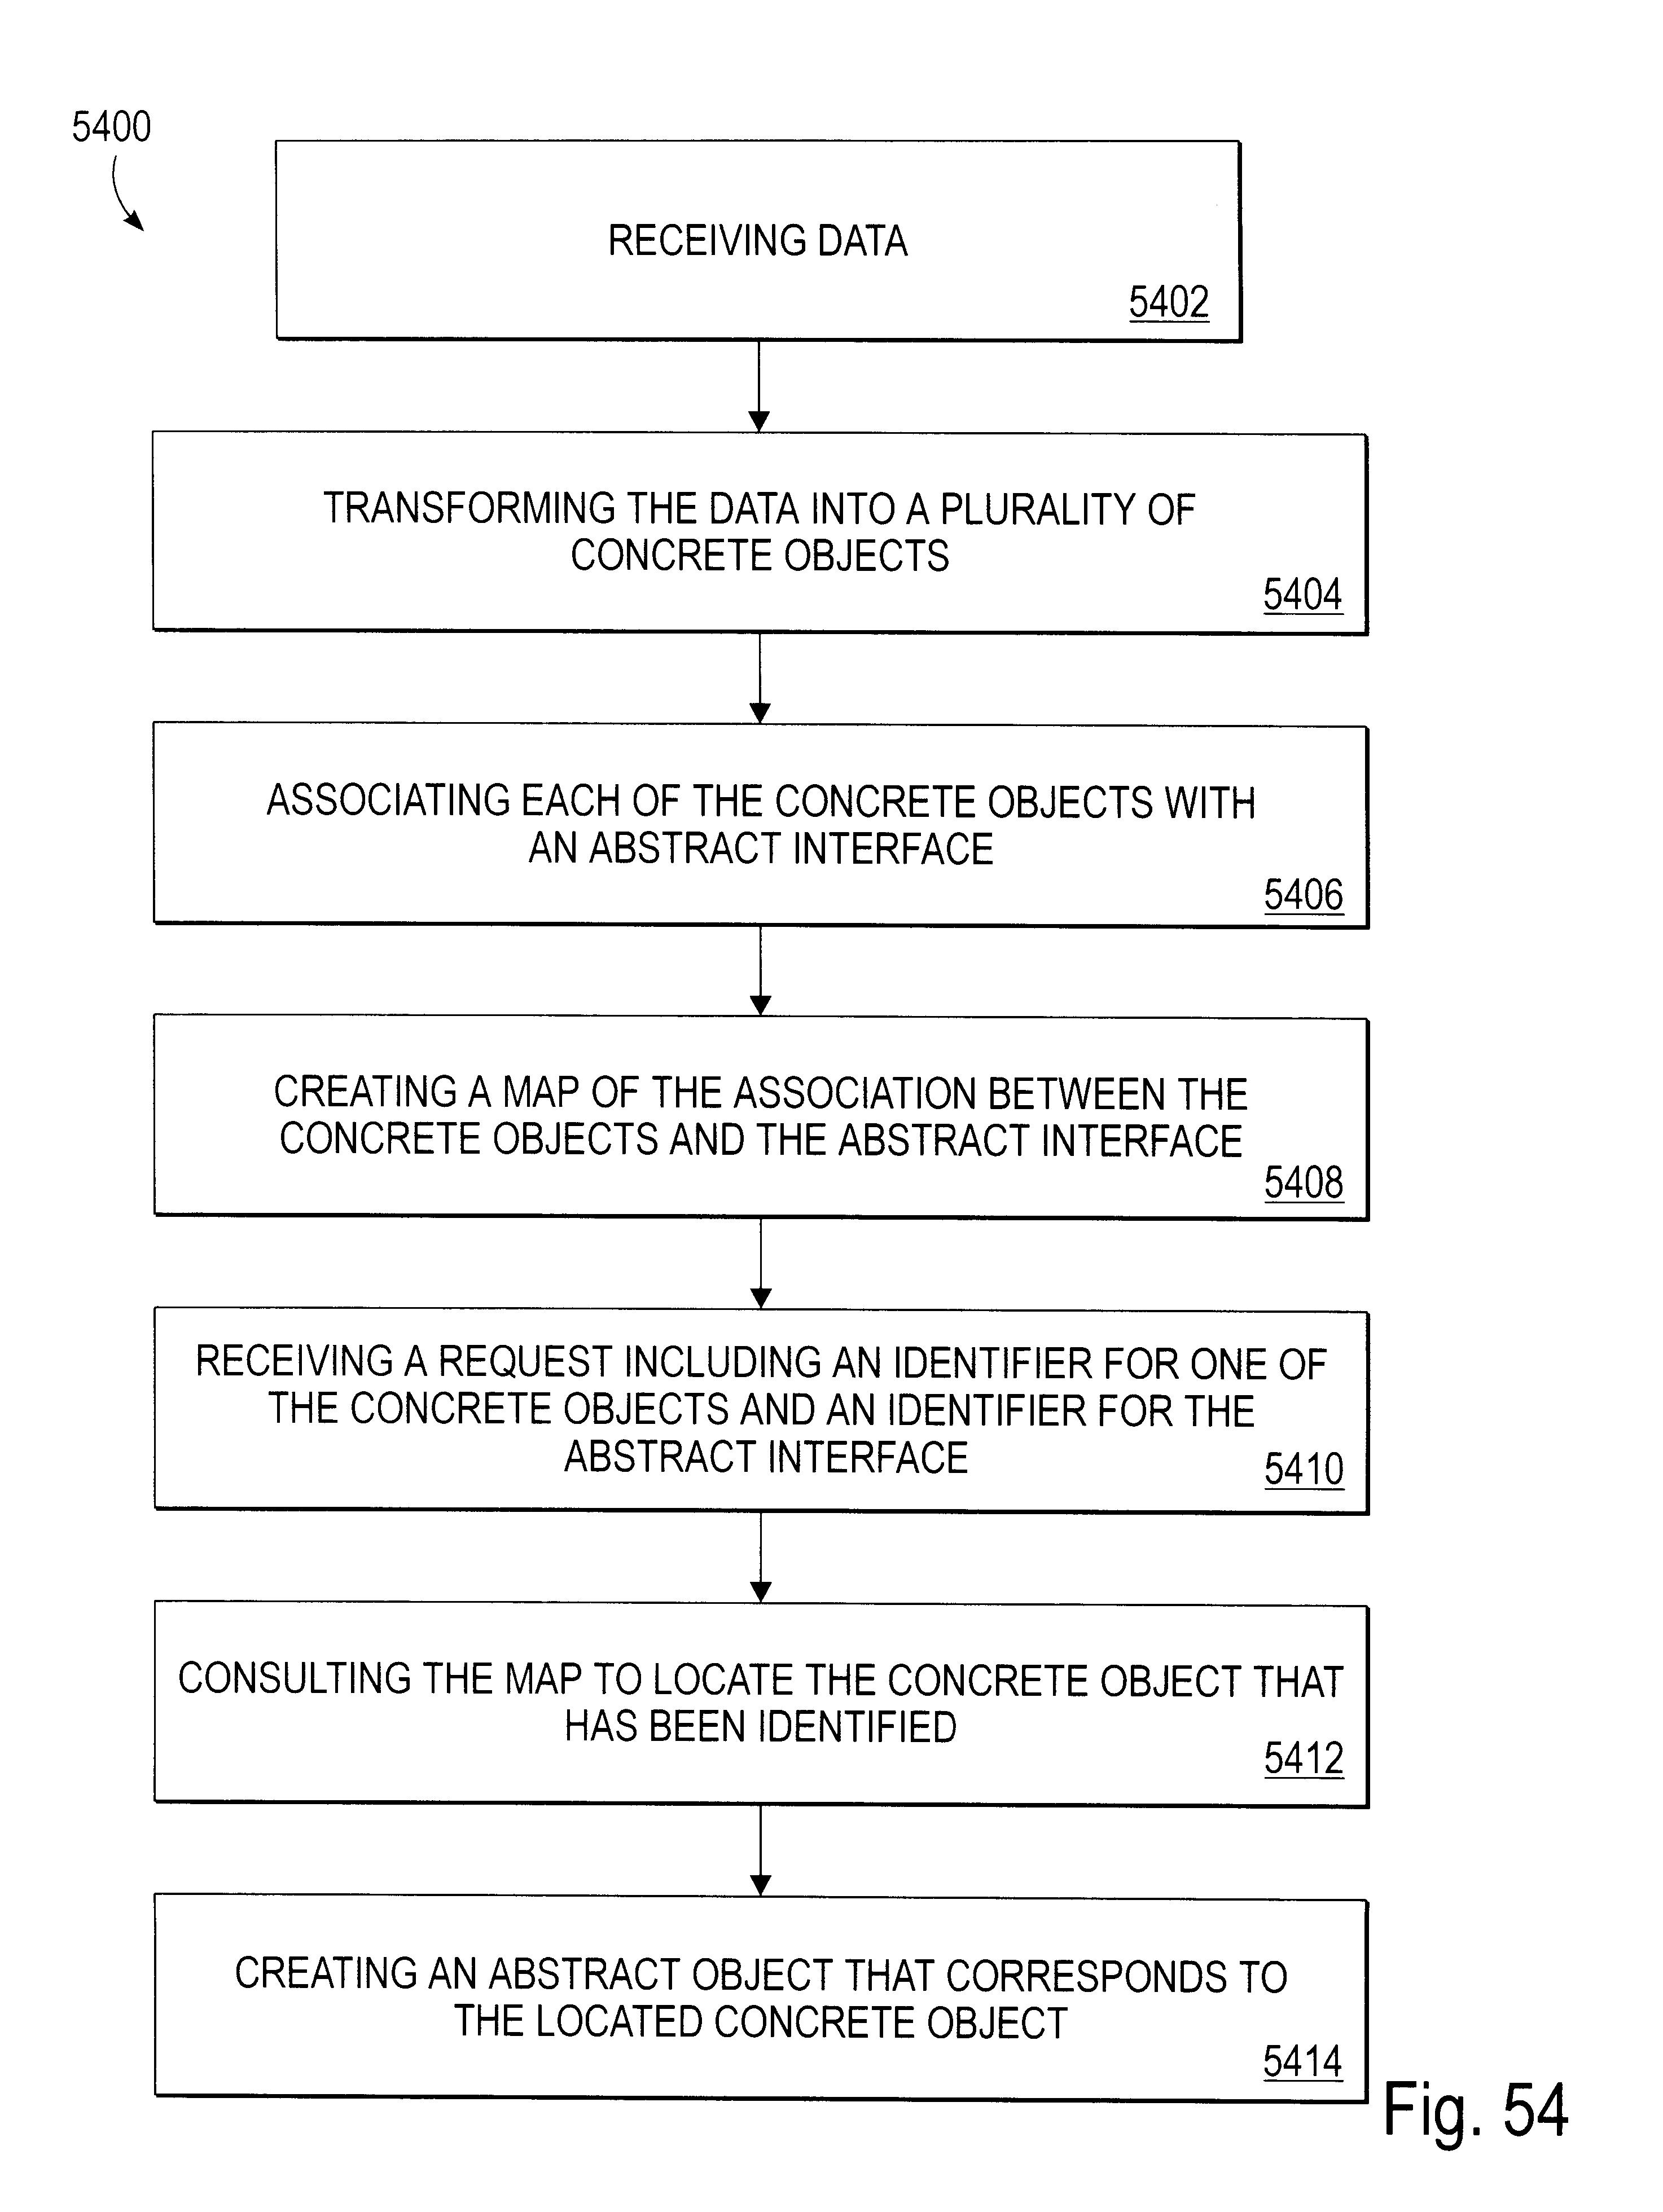 Patent US 6,332,163 B1